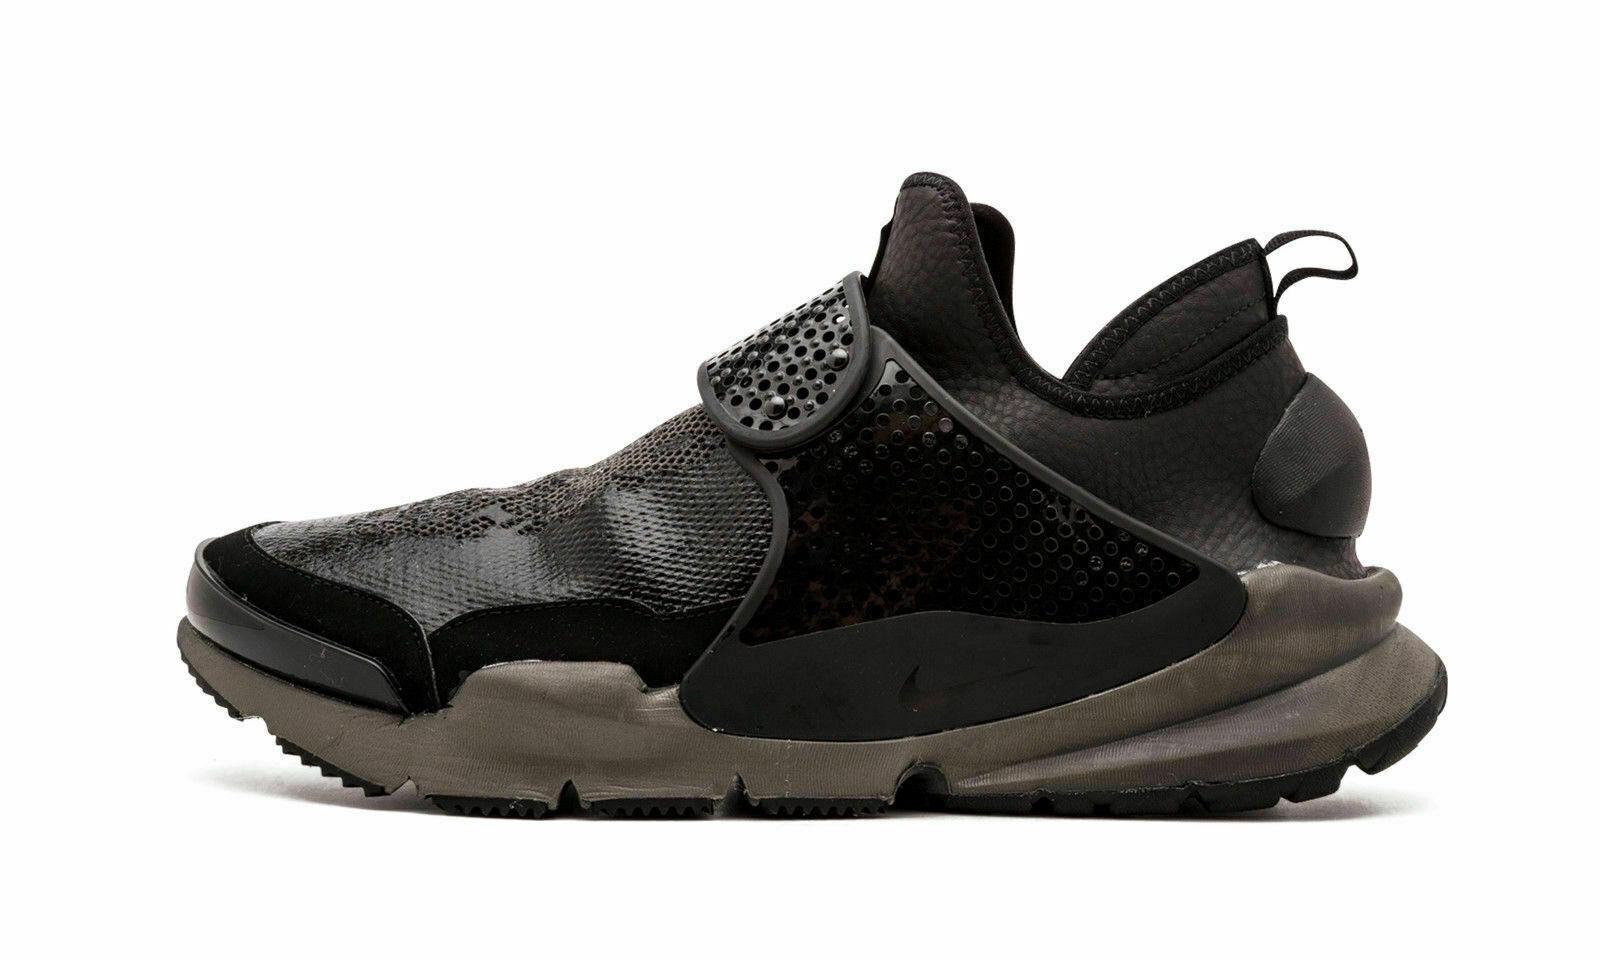 Nike Stone Island Sock Dart mediados X Negro Negro Negro 910090-001 Talla 8 EE. UU. 700f99